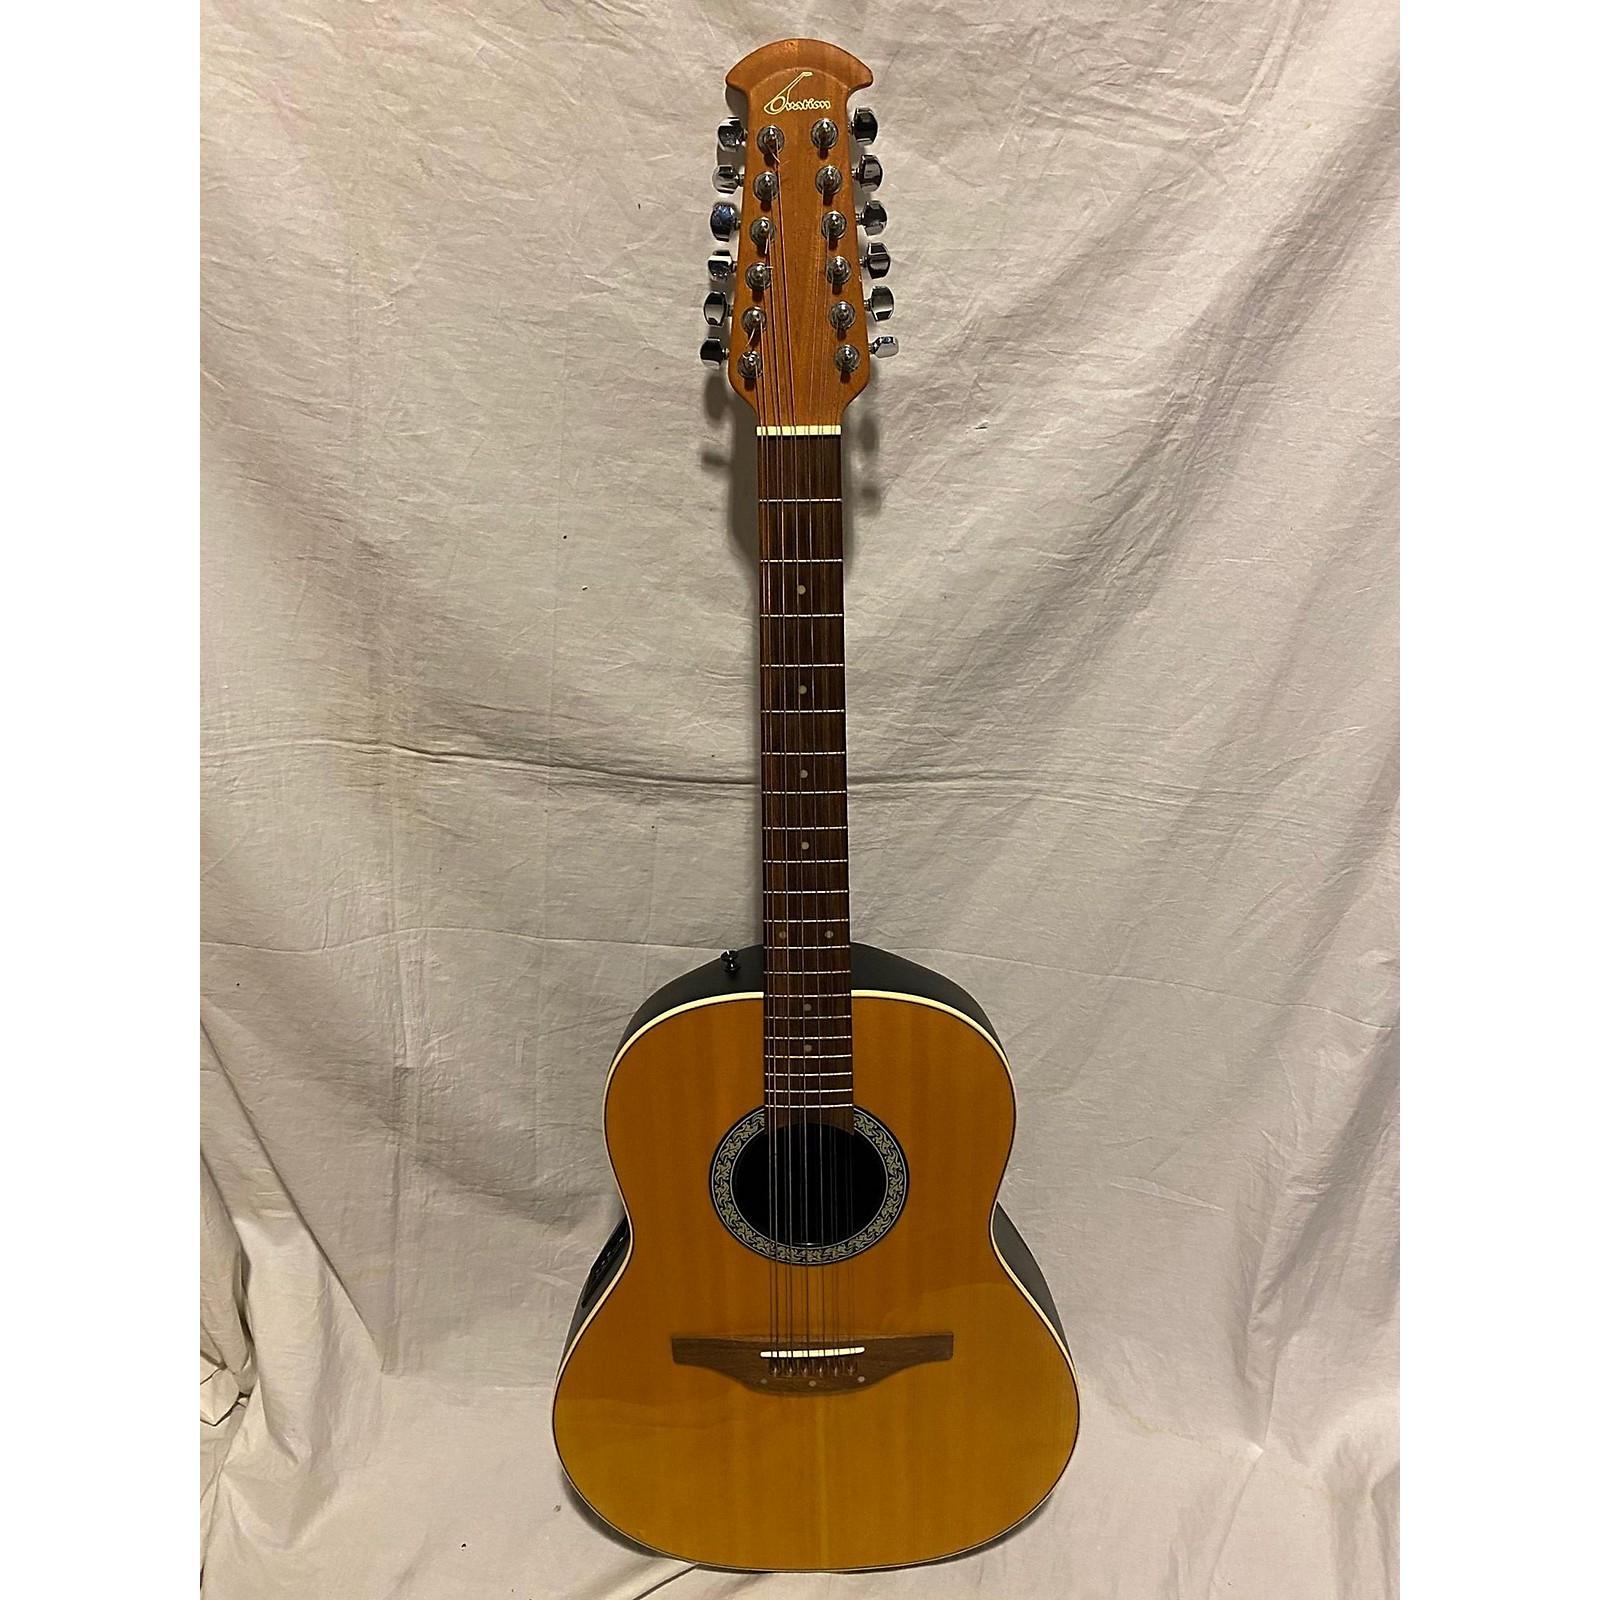 Ovation BALLADEER STANDARD 1751 12 STRING GUITAR 12 String Acoustic Electric Guitar